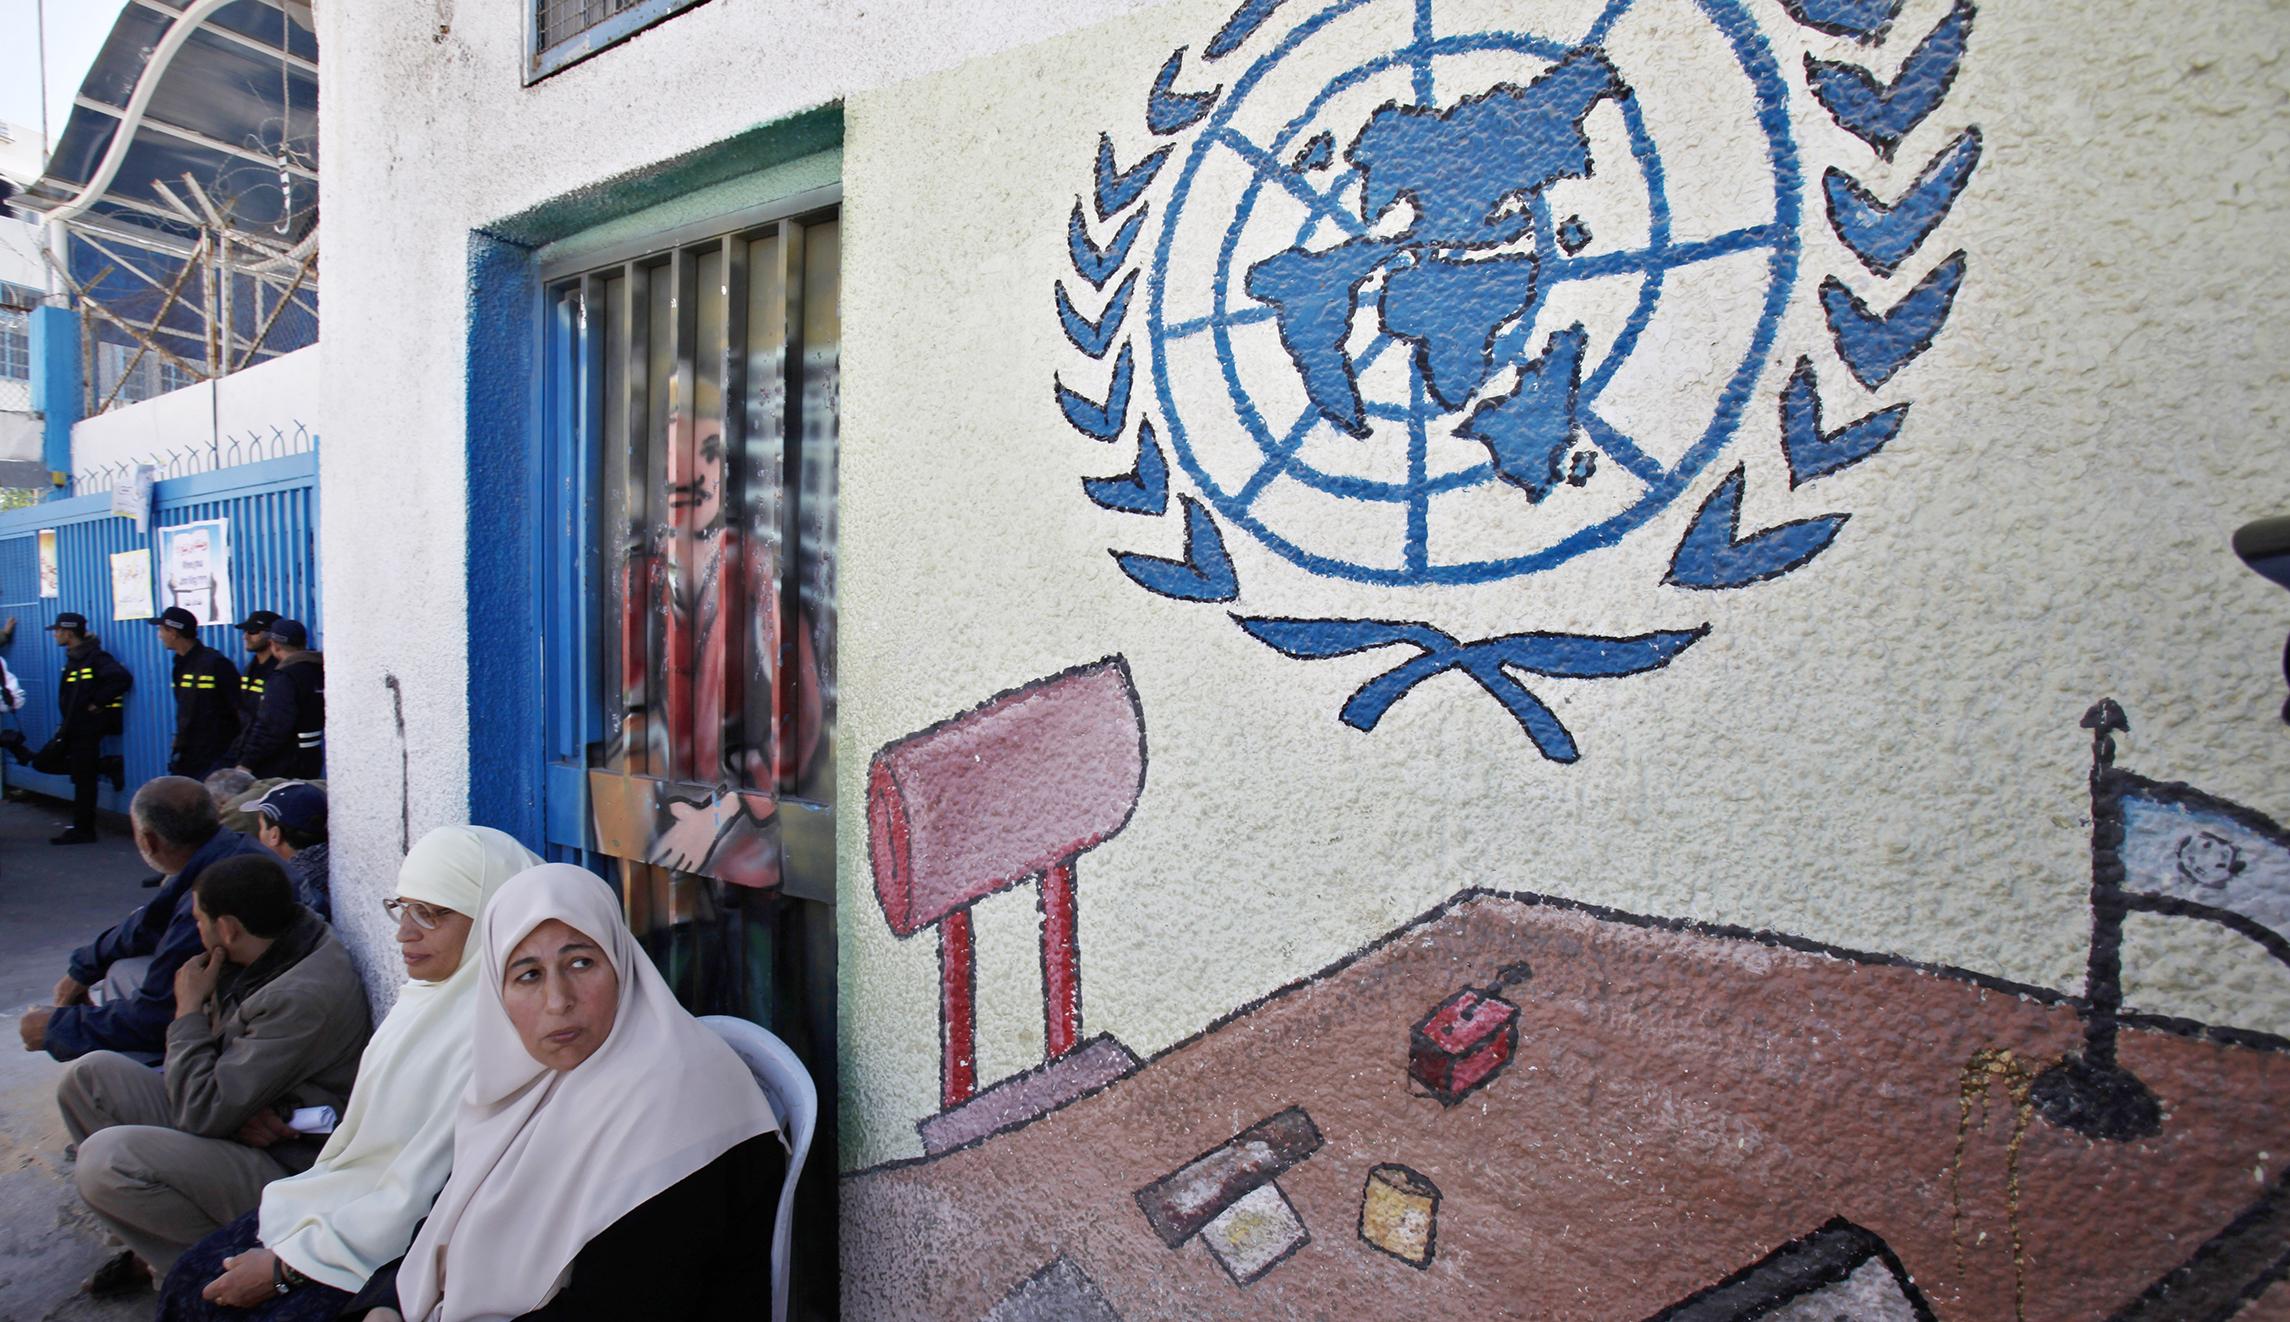 Congress must fix UNRWA's Hamas problem